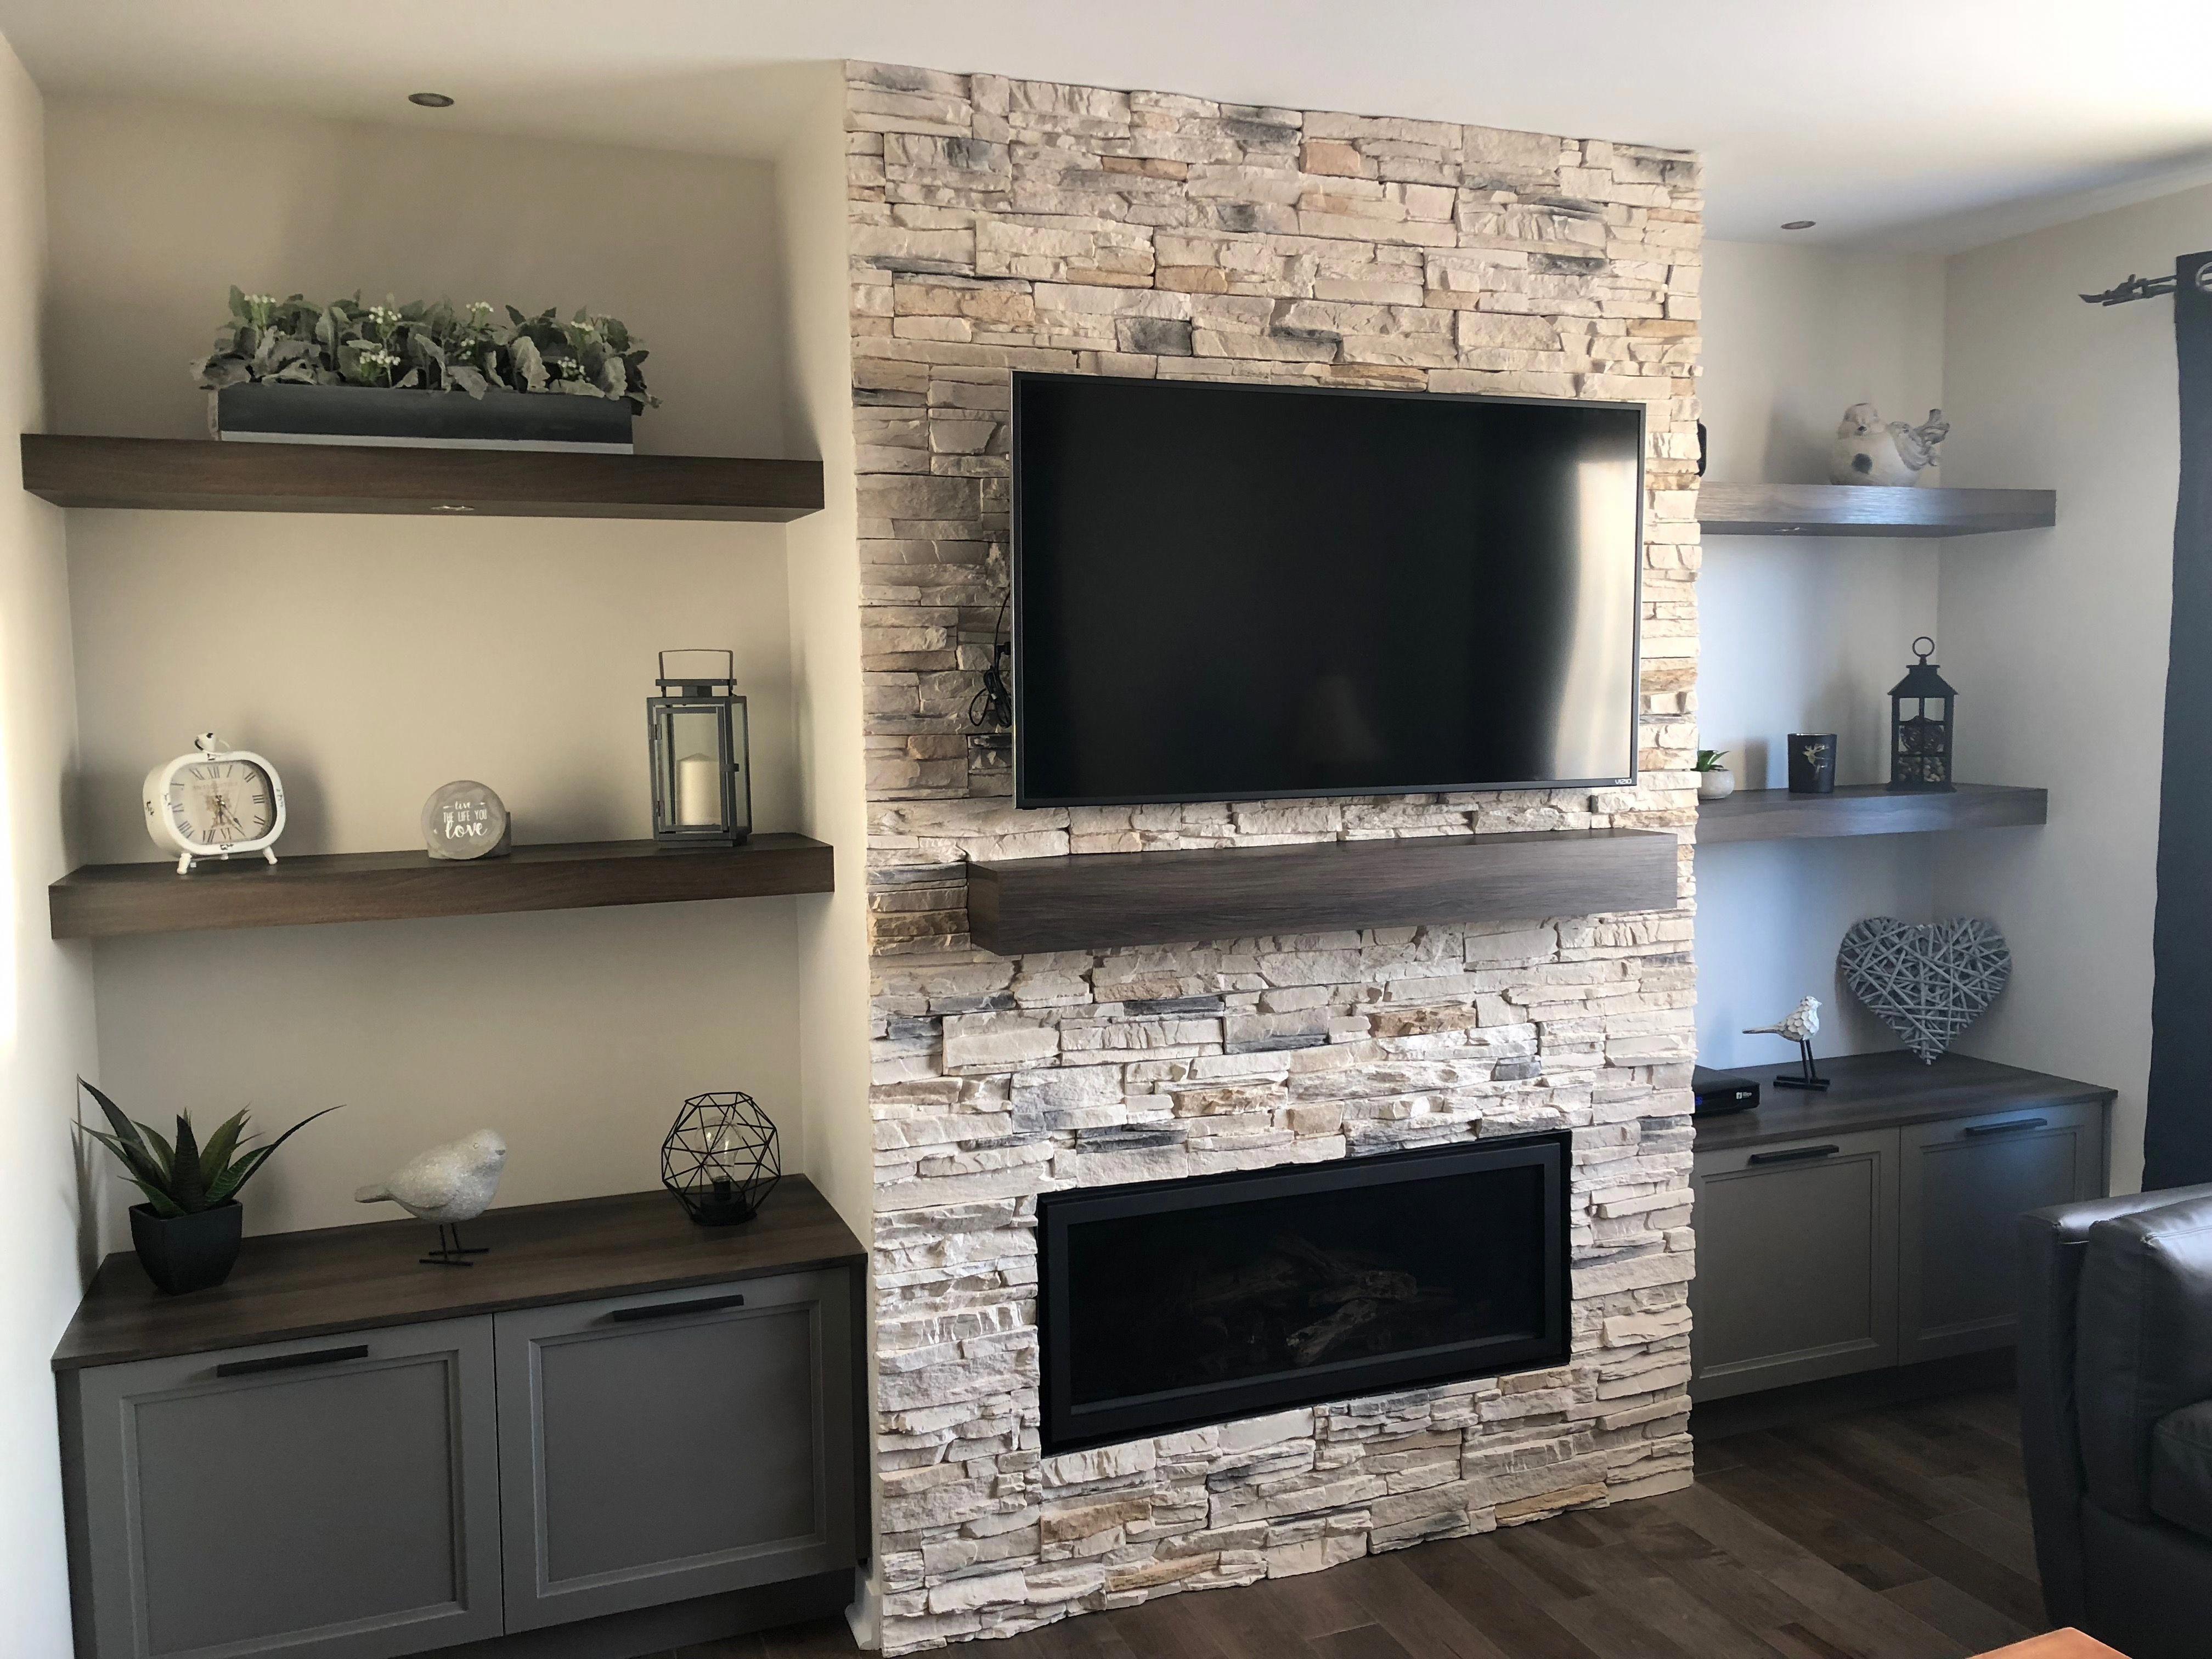 Best Basement Couches Small Basement Decor Basement Ceiling Design Ideas 20190620 Fireplace Built Ins Small Basement Decor Family Room Design